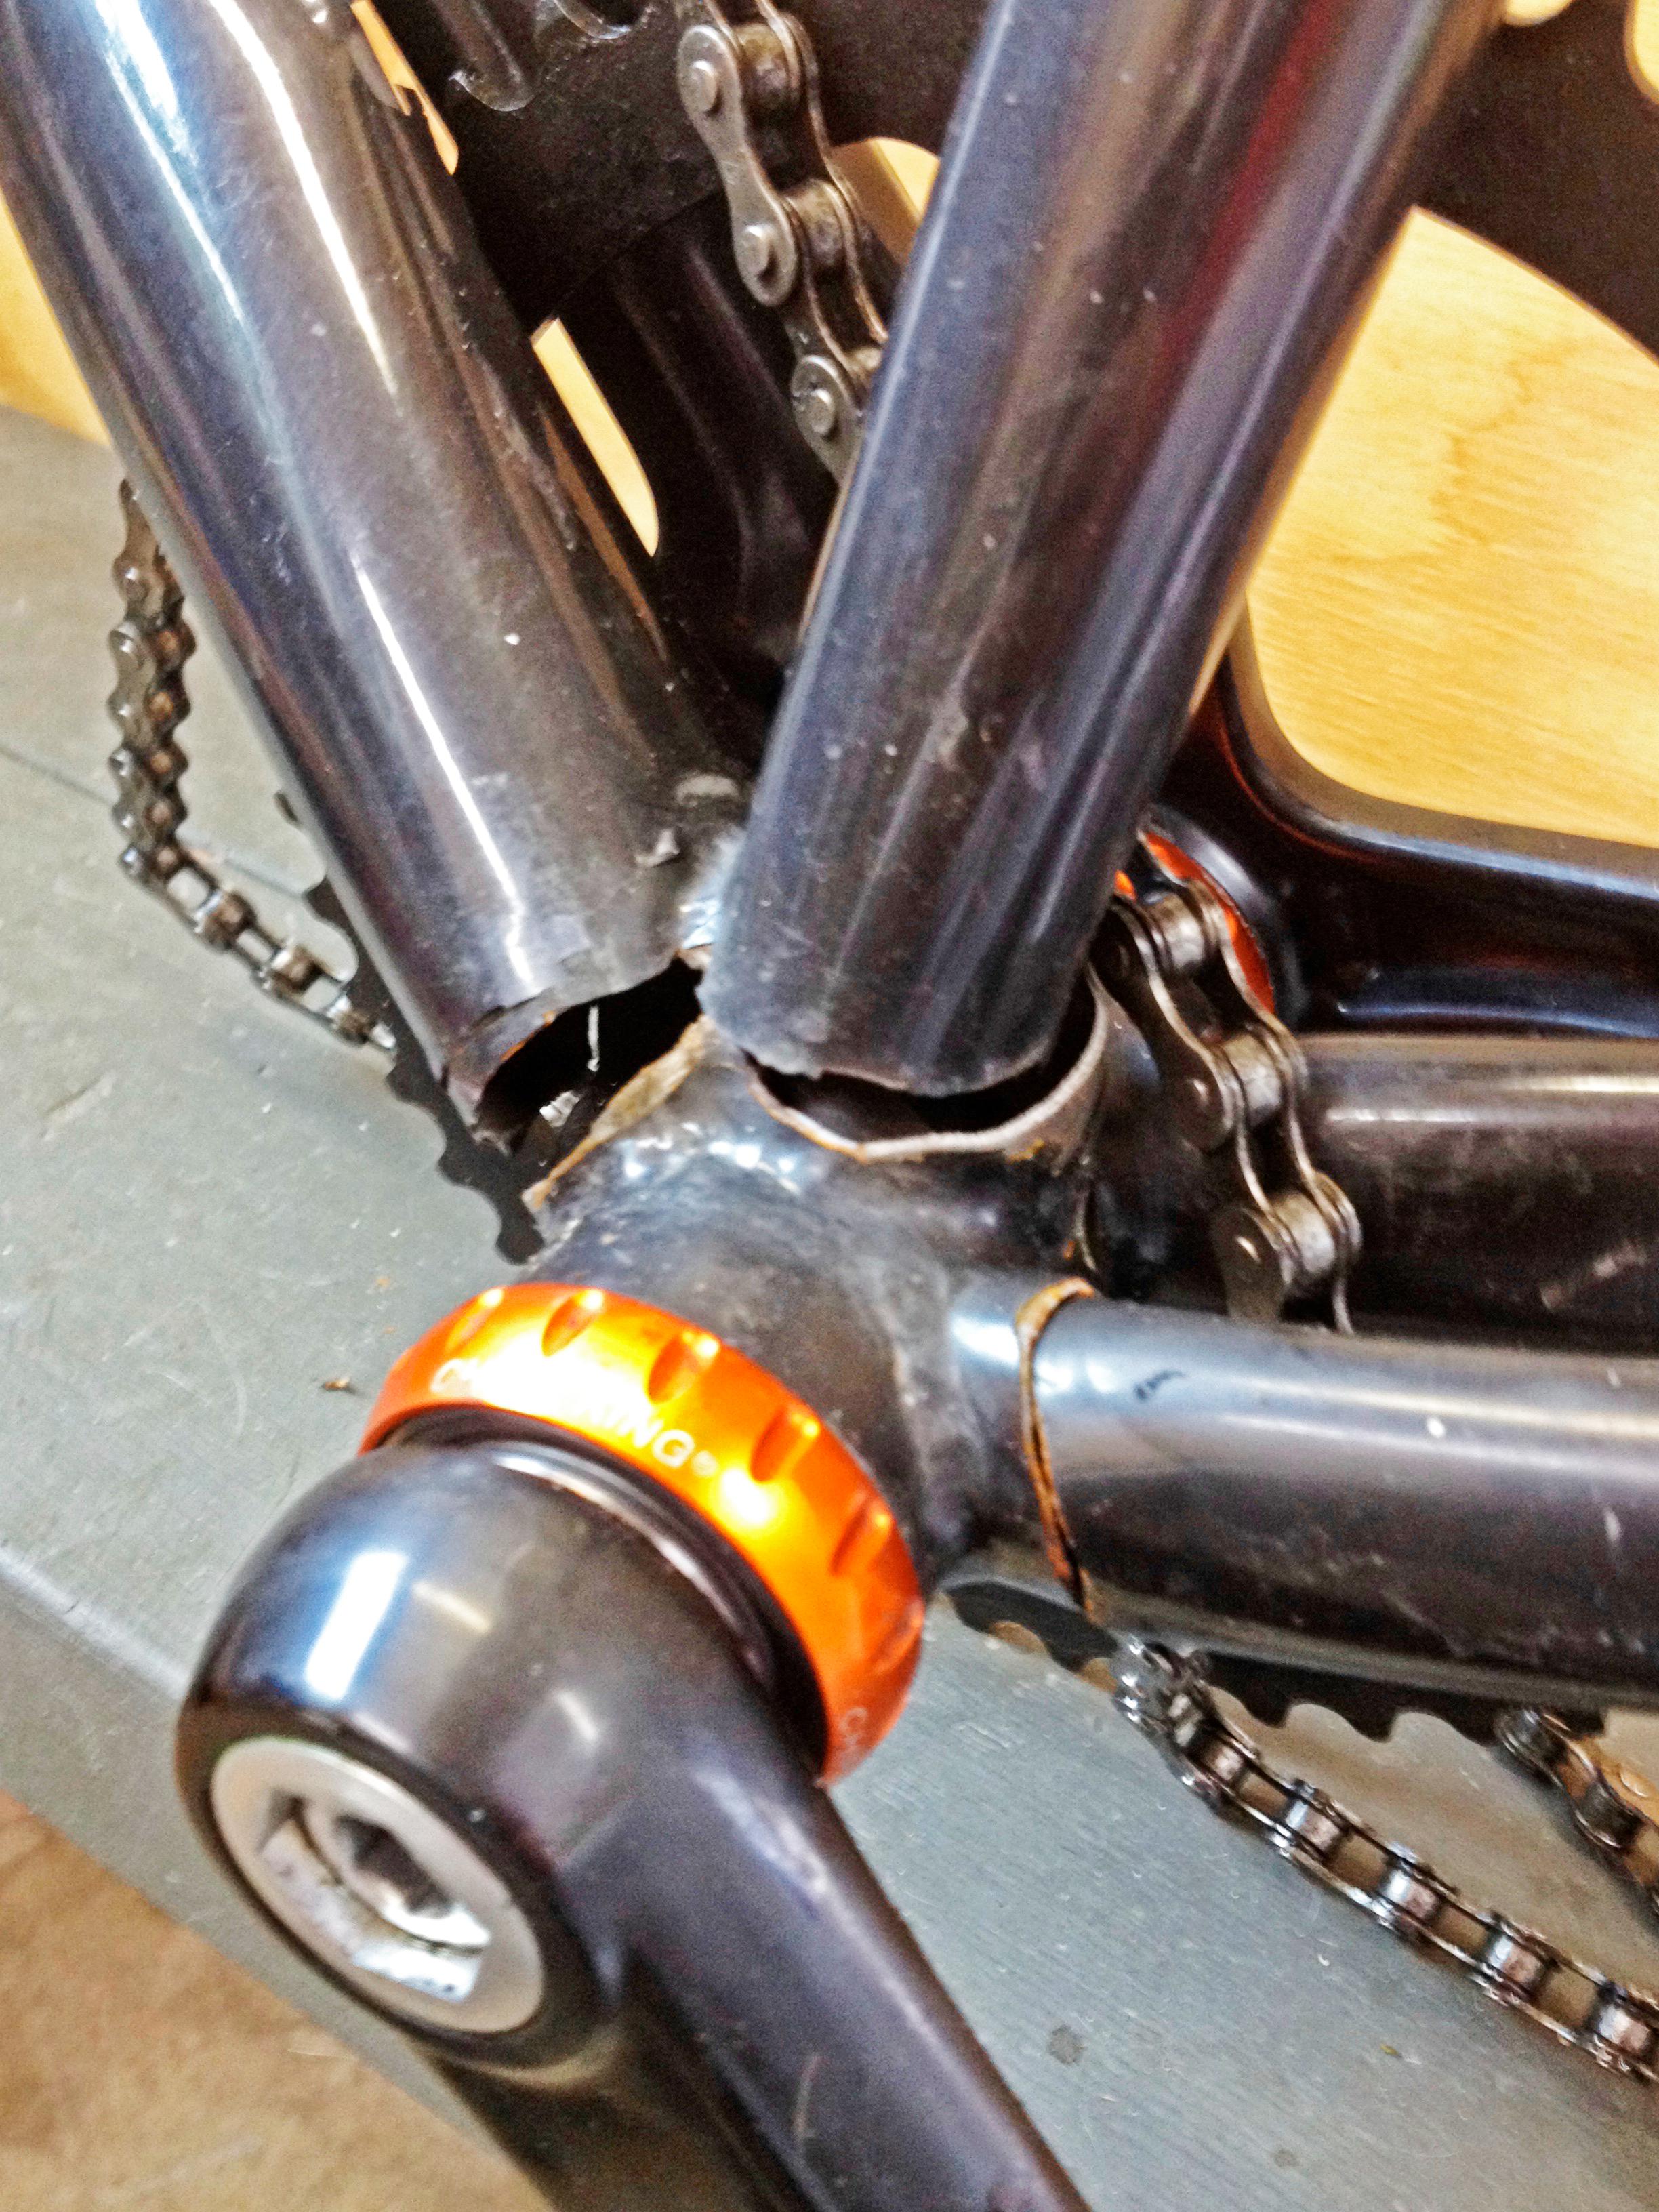 Distroyed bike 3.jpg